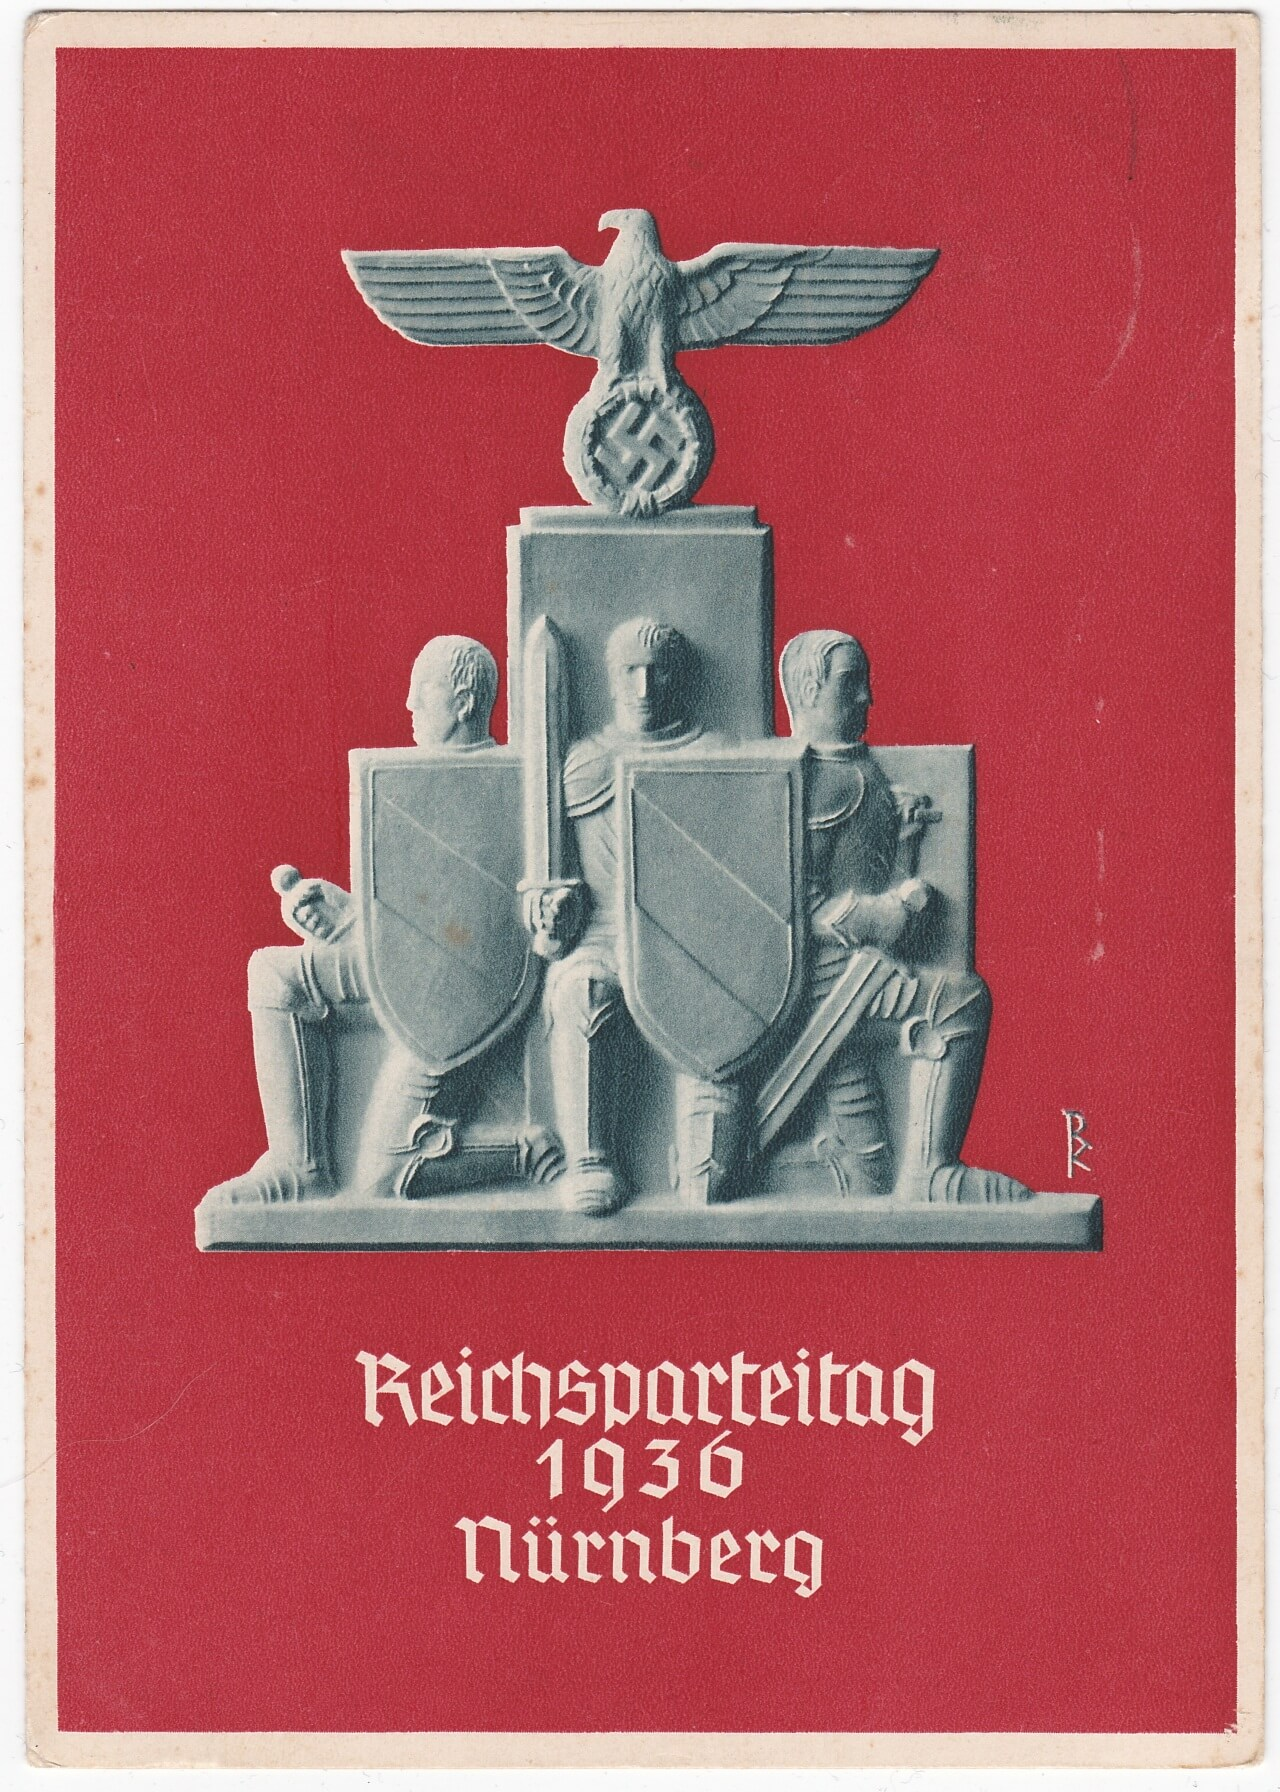 postkaart reichsparteitag 1936 nurnberg